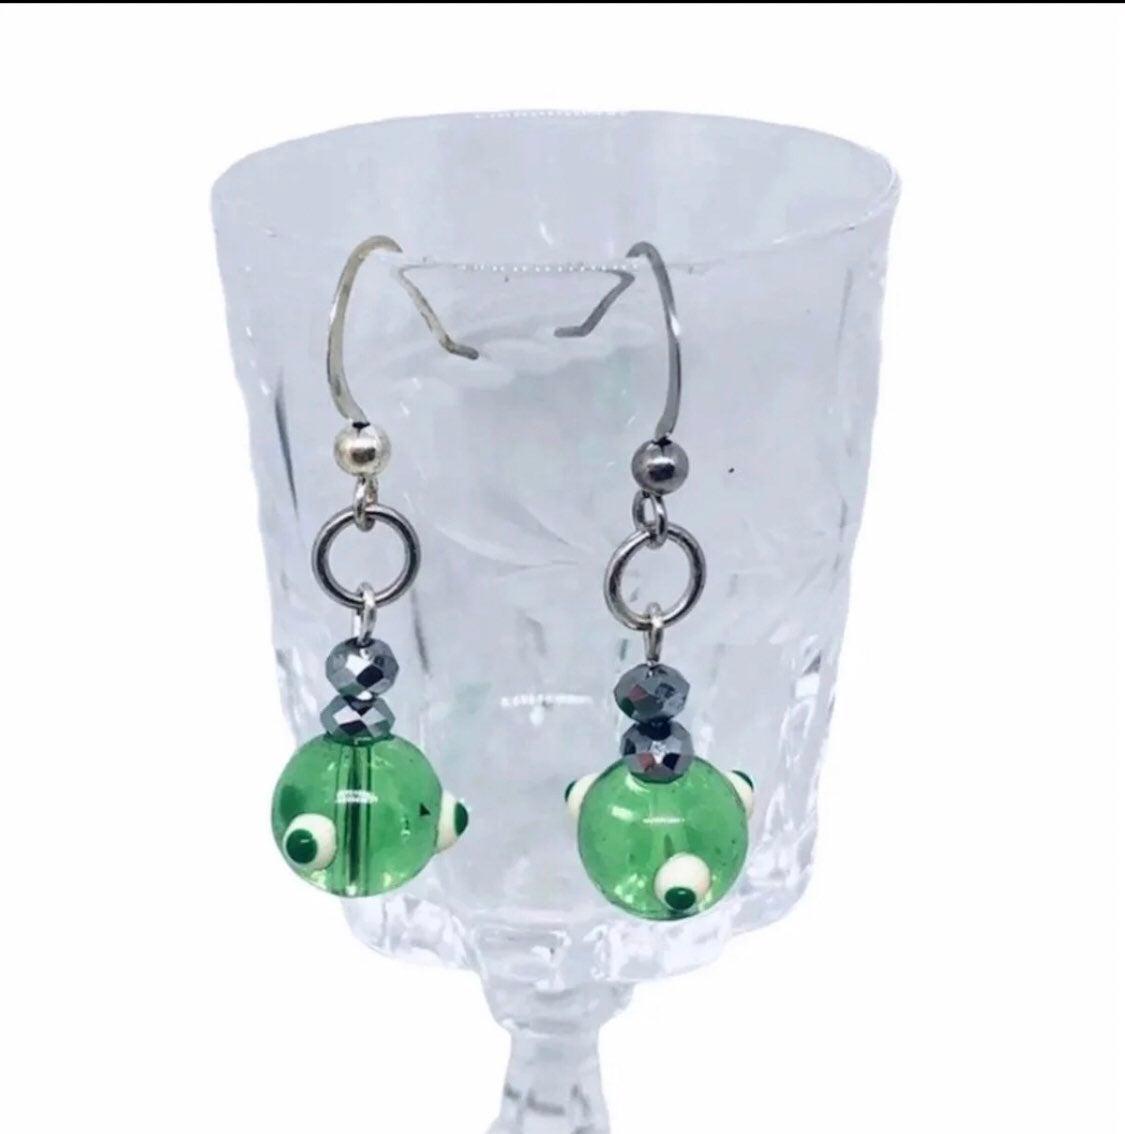 Green evil eye Earrings - new